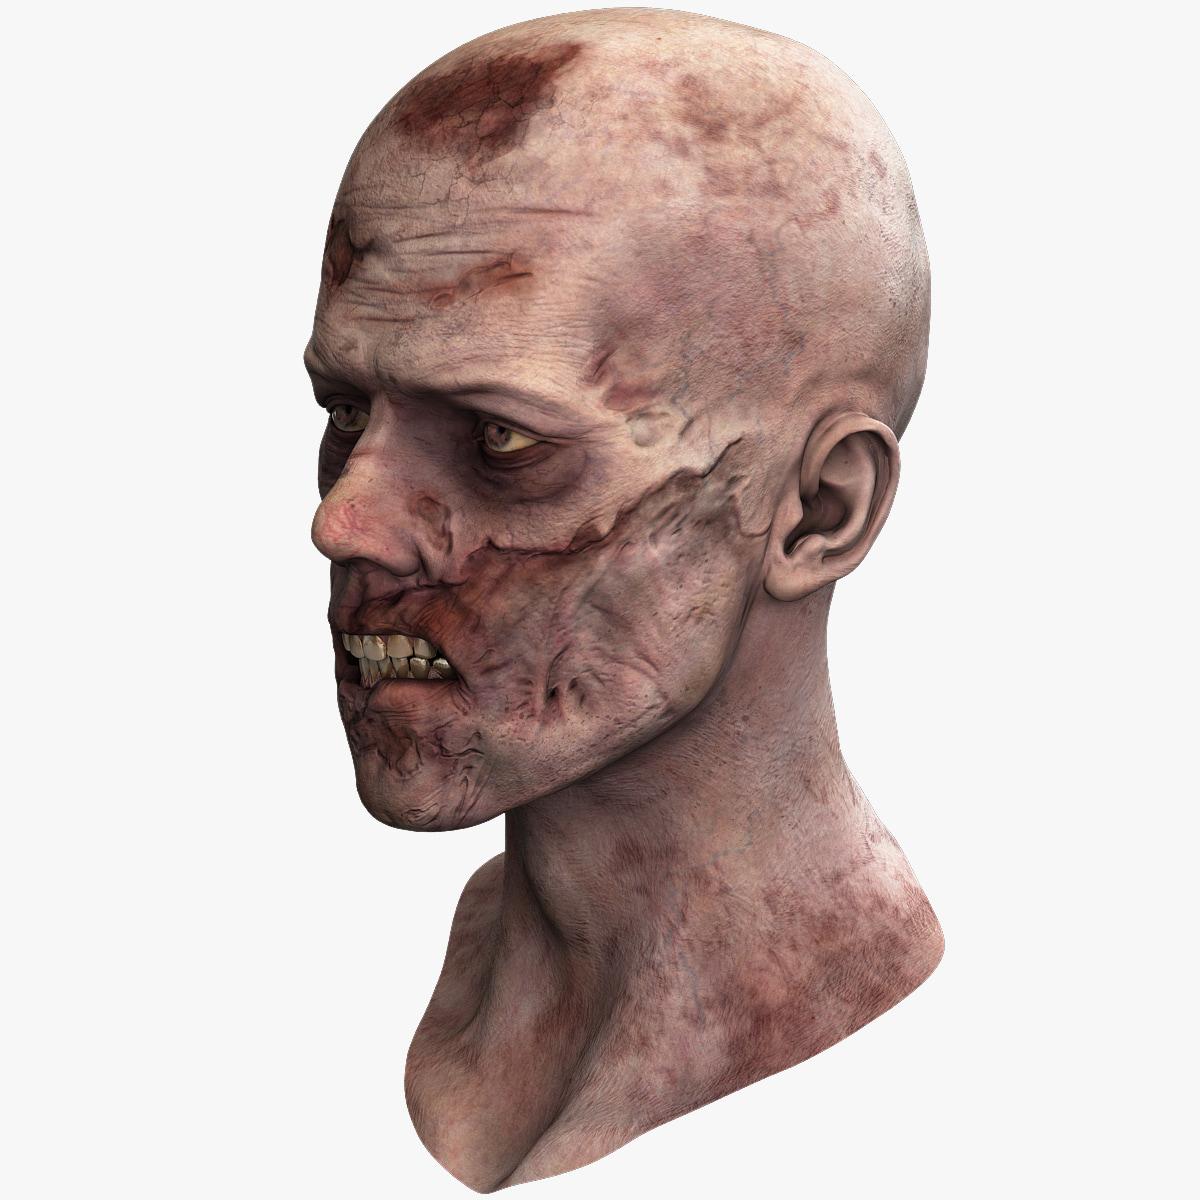 Zombie_Head_2_000.jpg